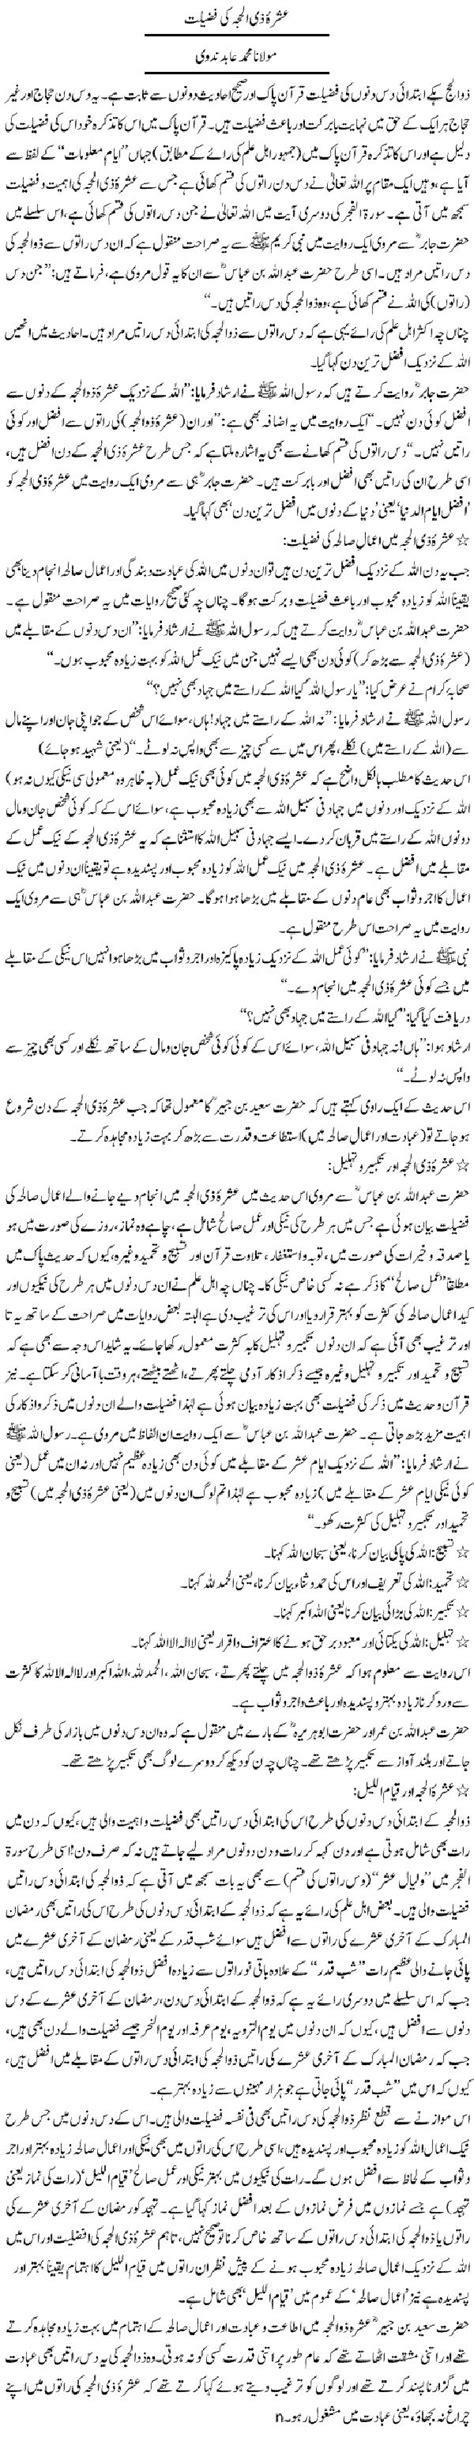 hitler biography urdu 58 best images about meri urdu on pinterest 14 august